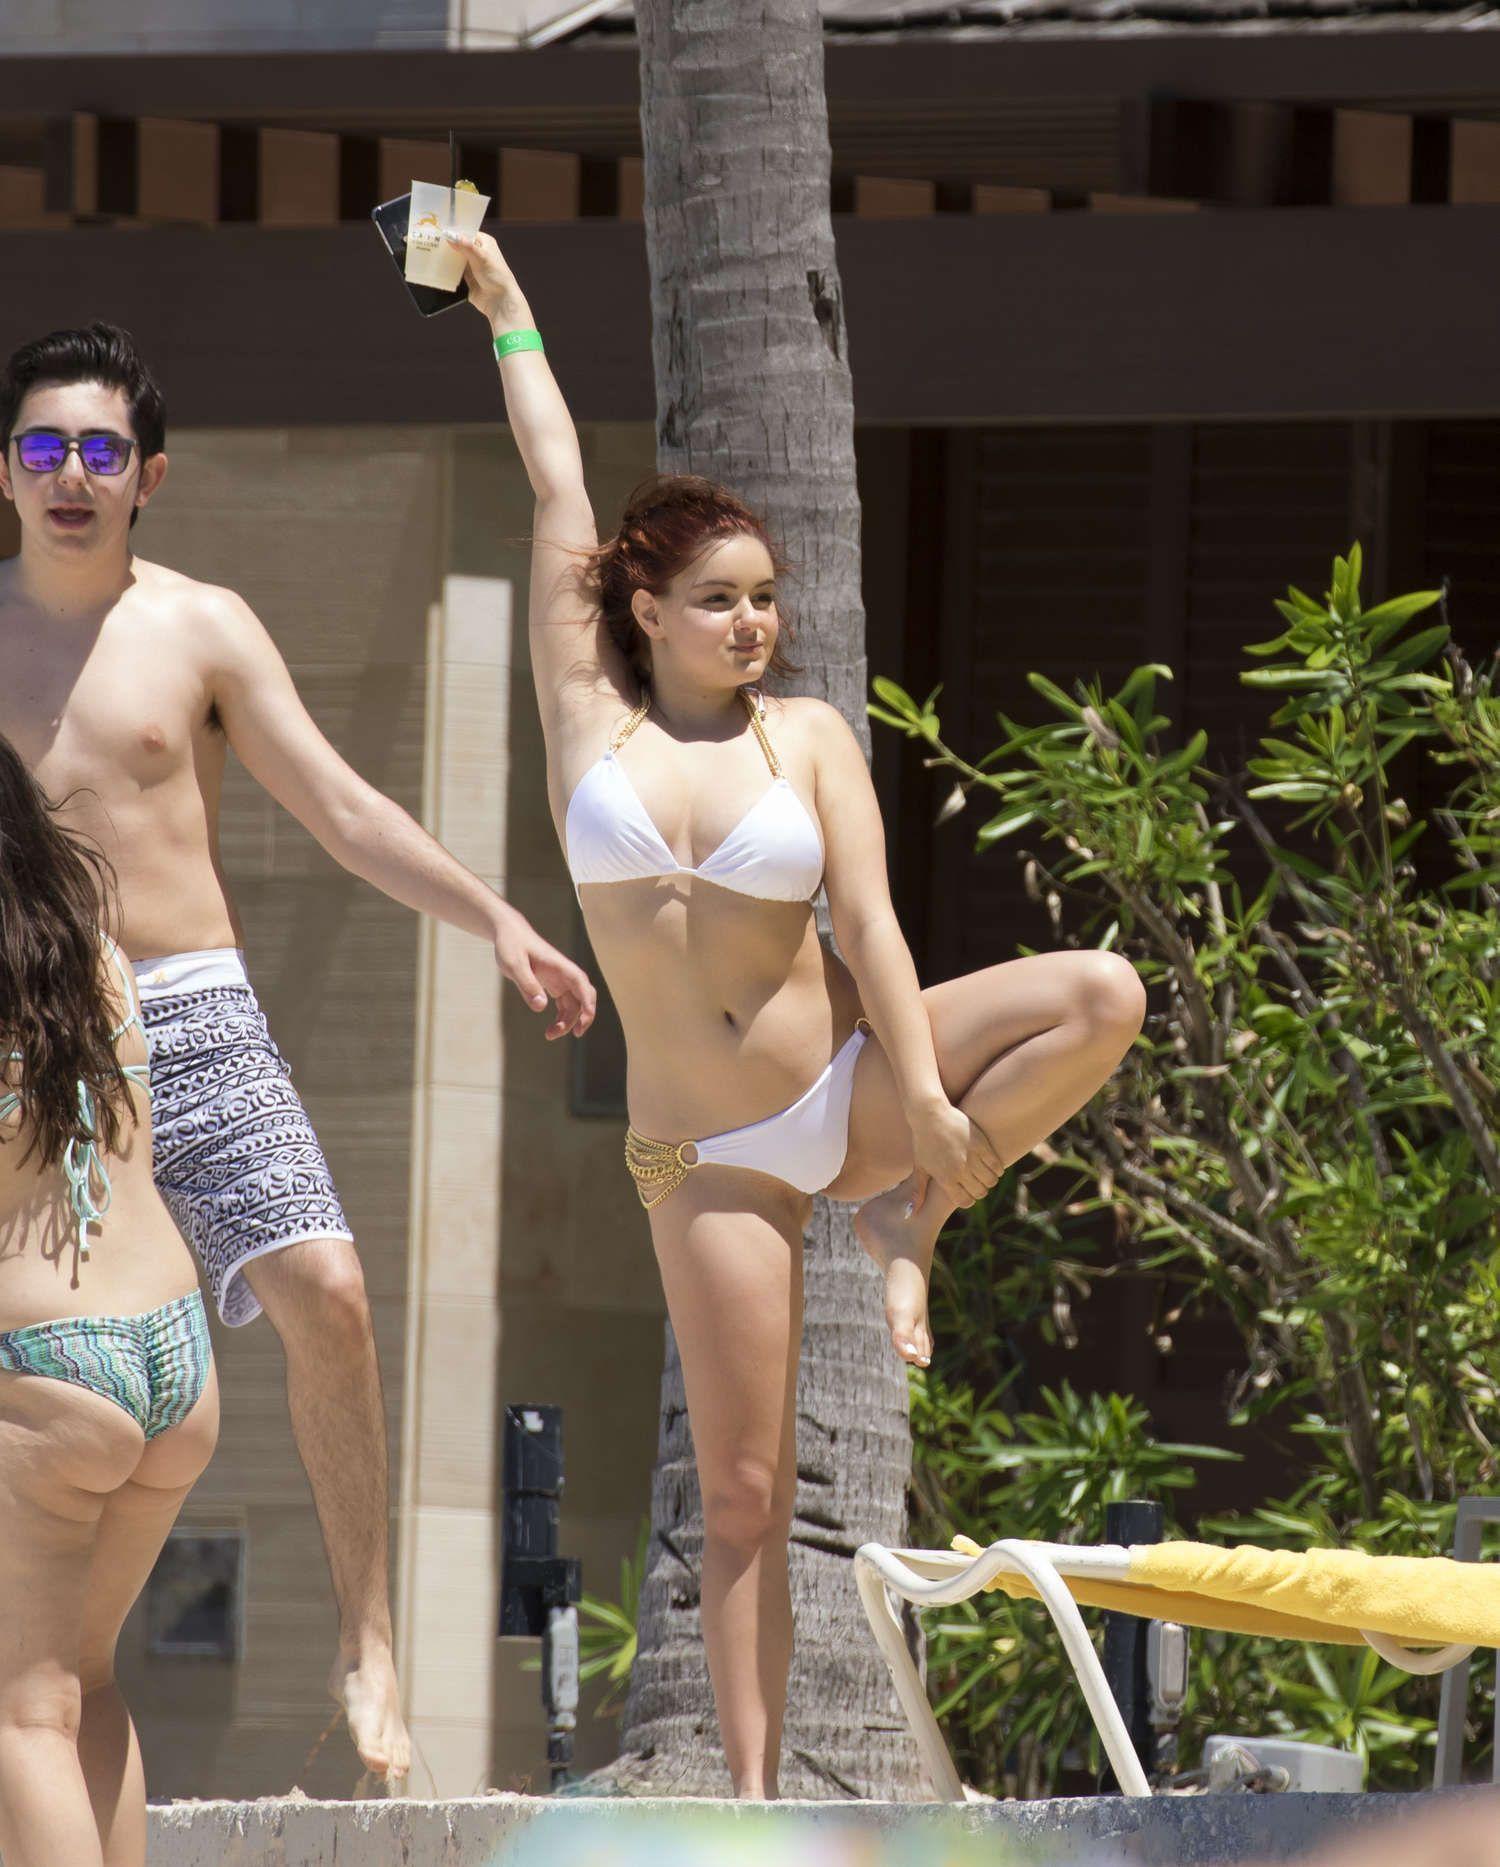 Ryan Newman Sexy -,Iwan rheon Porno pics & movies Taylor Momsen Strips In Her New Music Video,Brooke kinsella tits